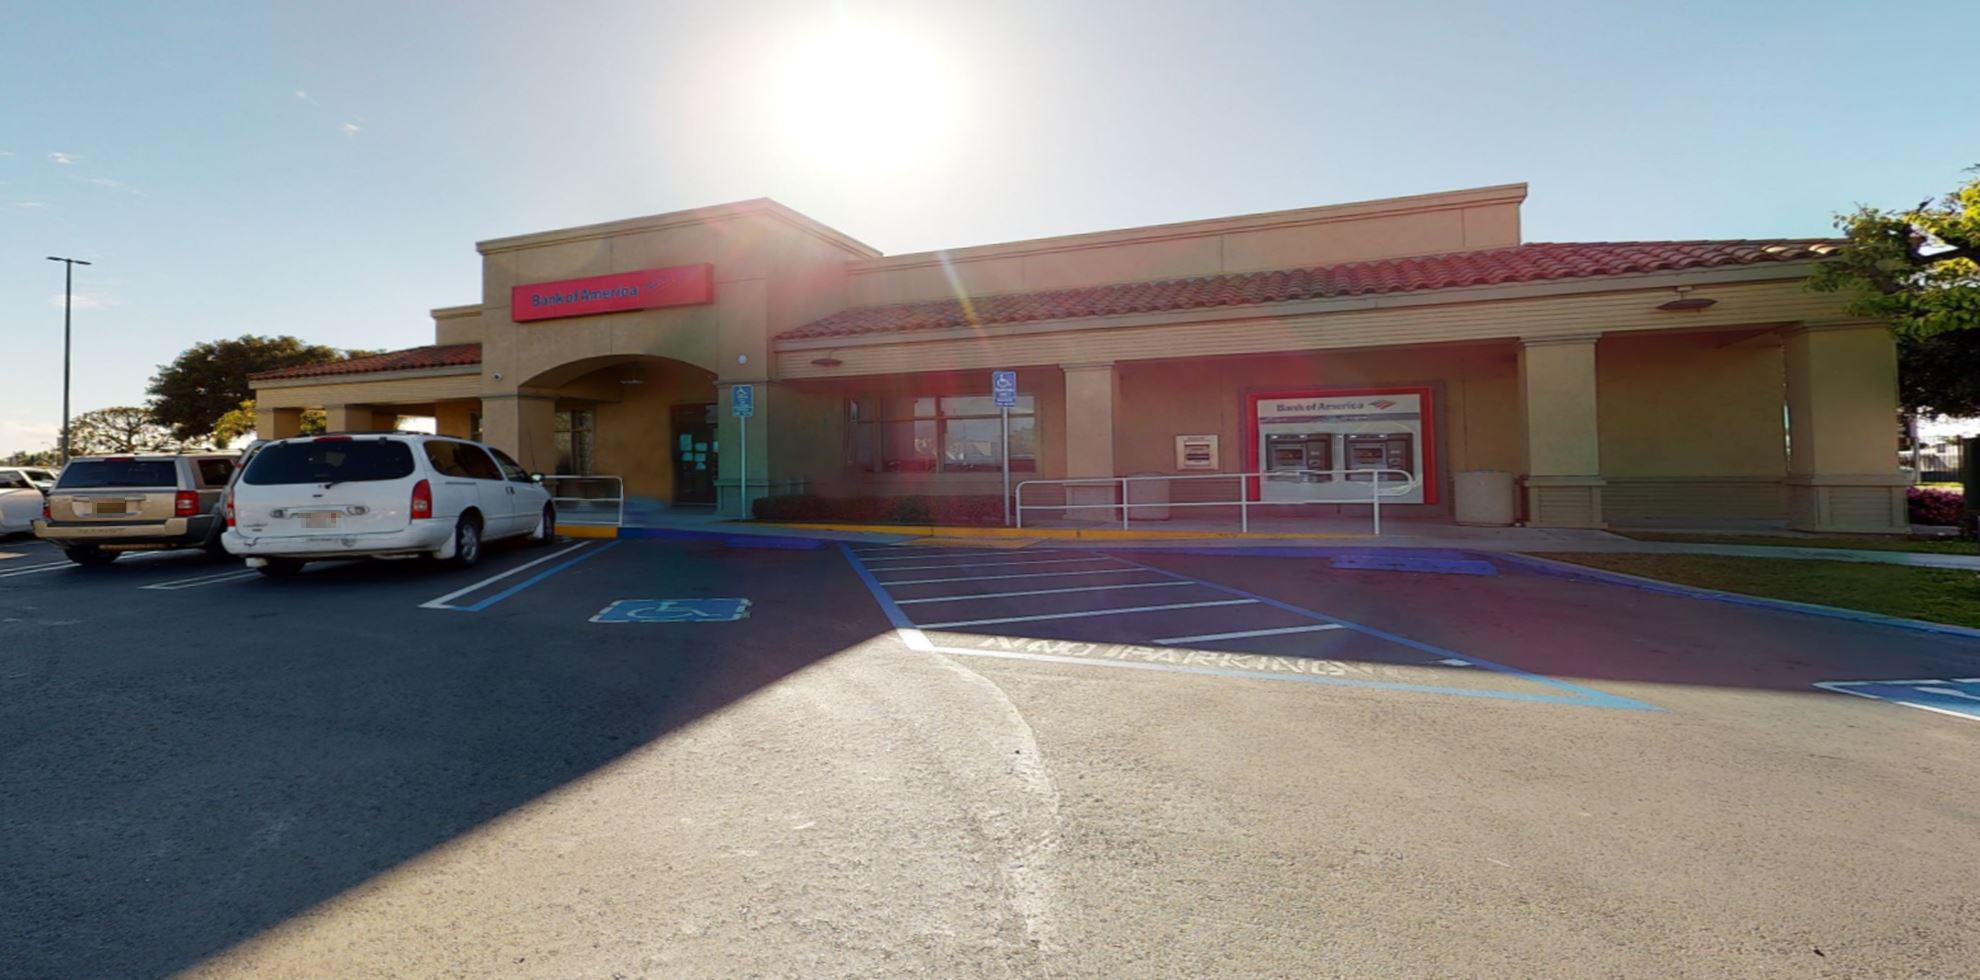 Bank of America financial center with drive-thru ATM | 605 Saturn Blvd, San Diego, CA 92154